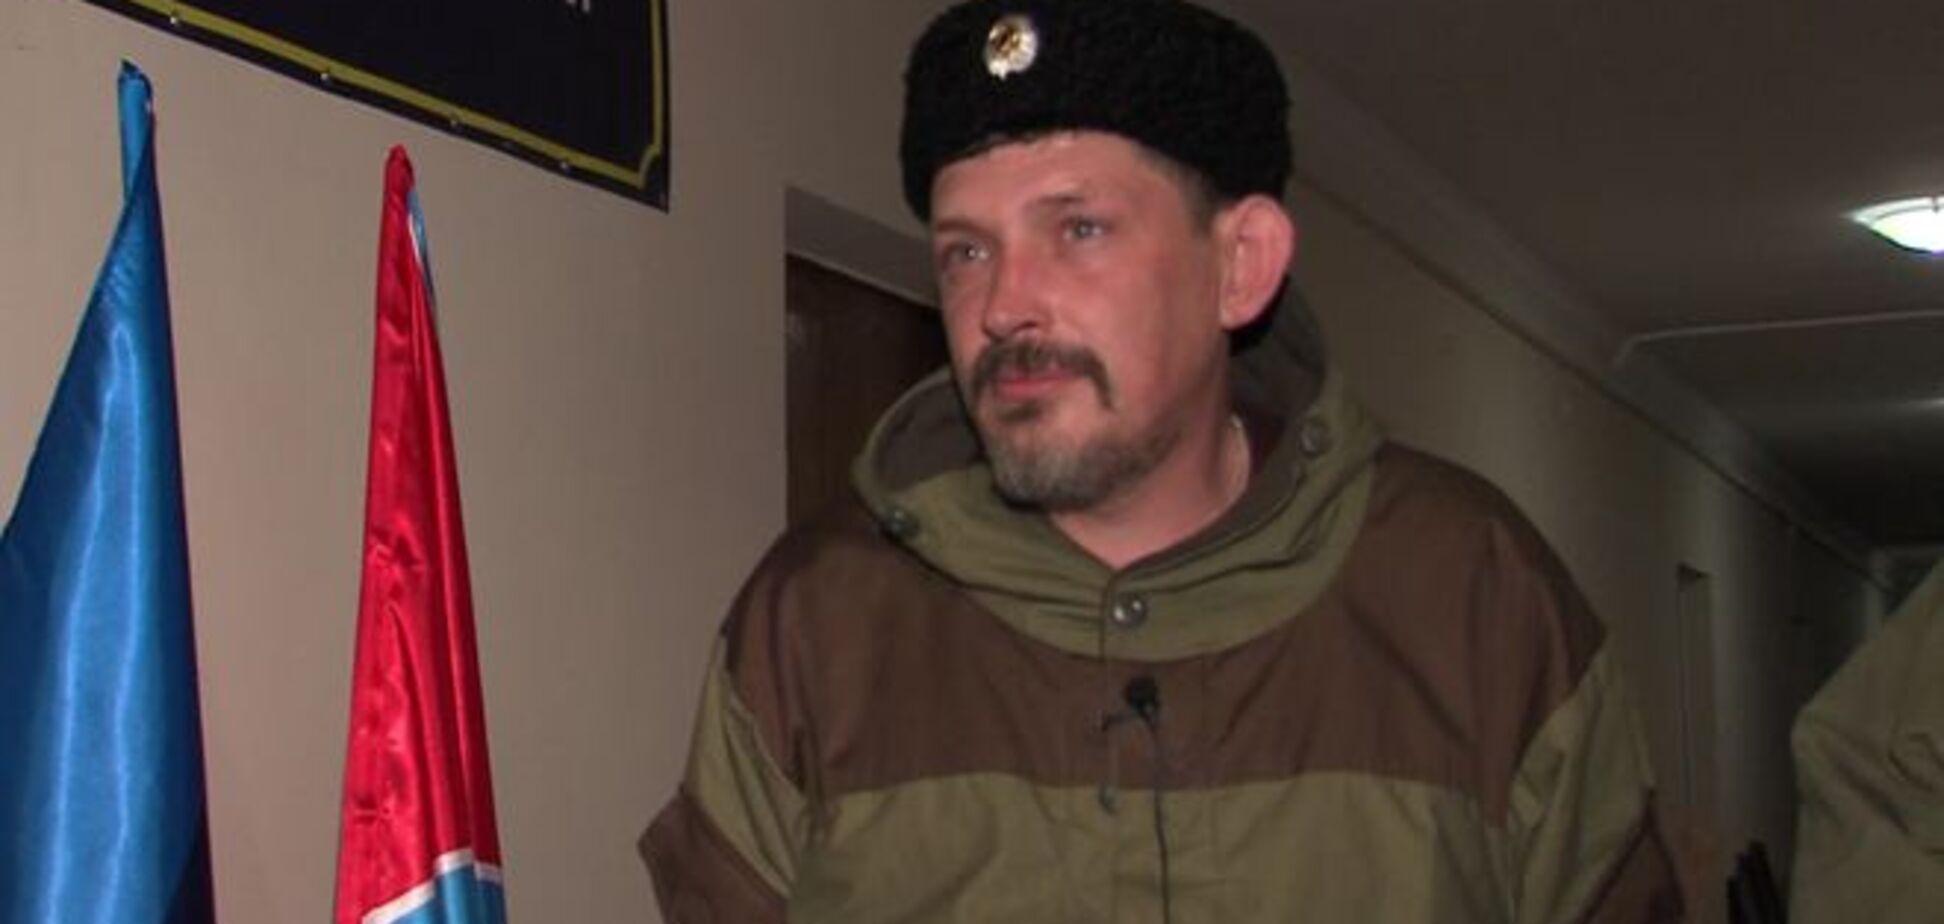 Разборки между боевиками набирают обороты: 'казаки' решили идти боем на 'ЛНР'